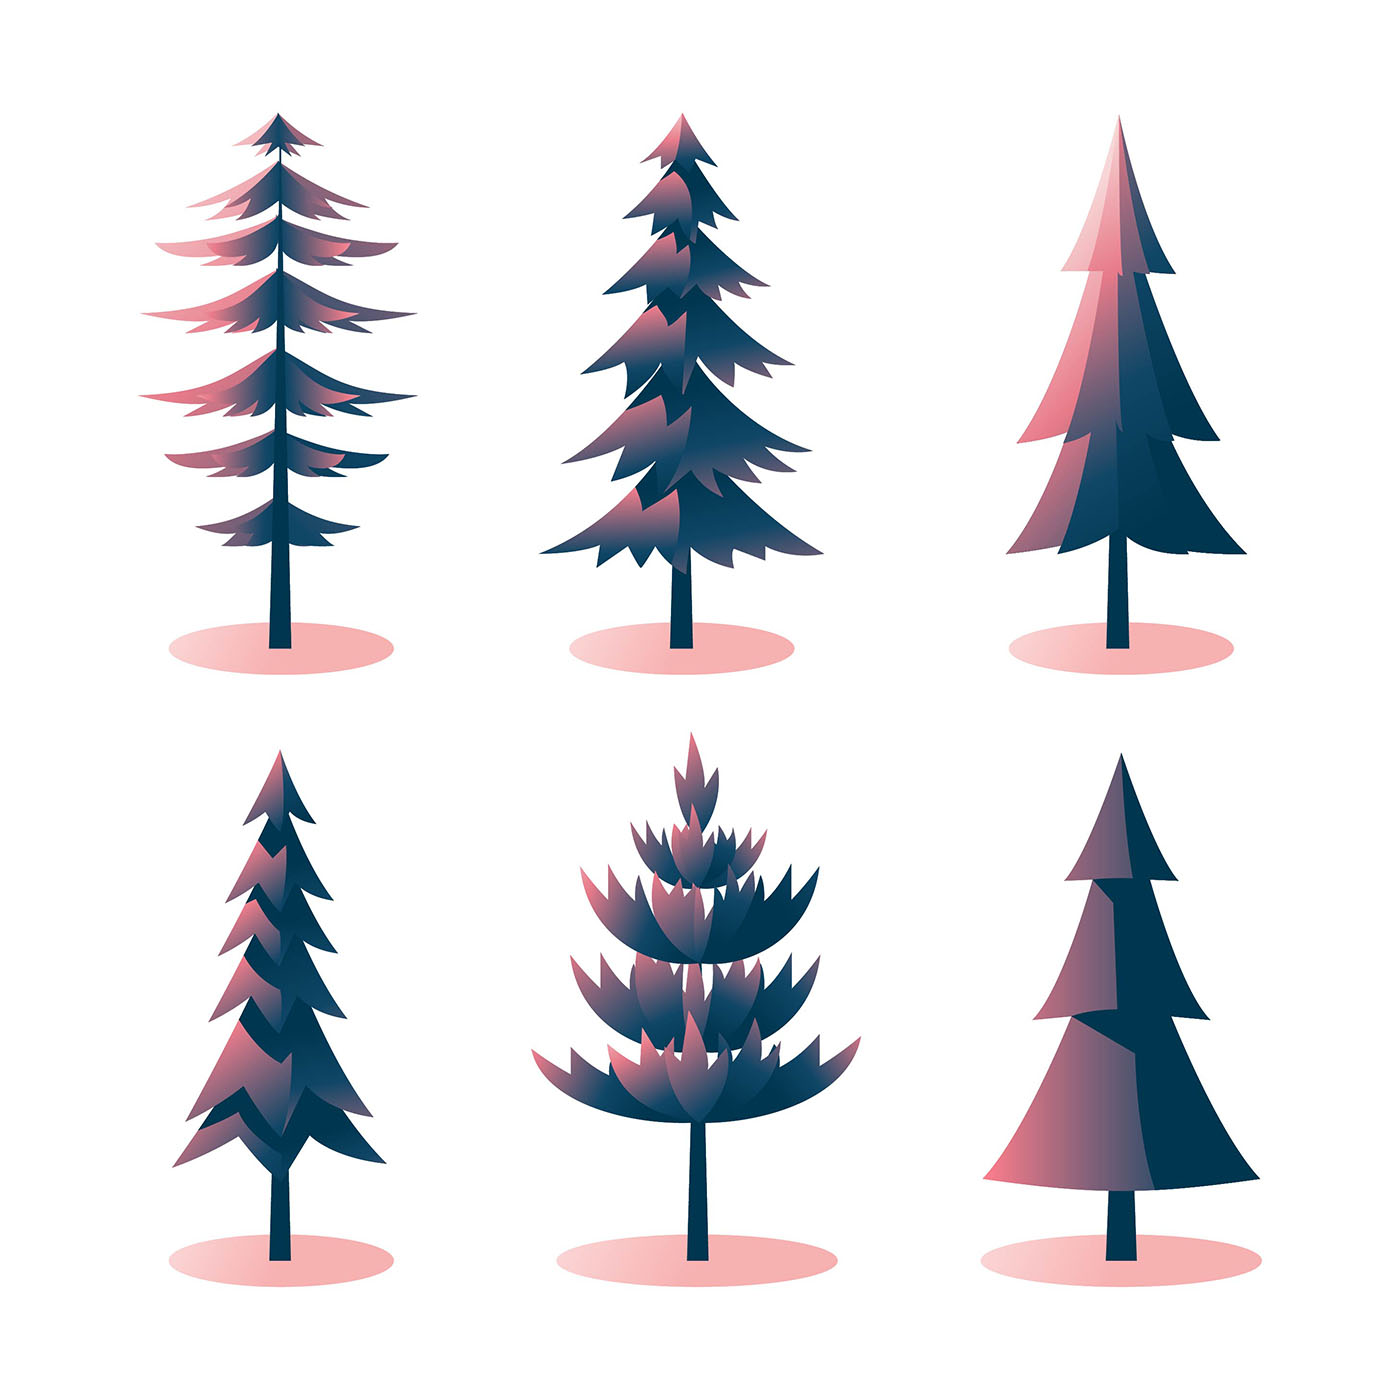 Pine Trees Clipart Set - Download Free Vectors, Clipart ...